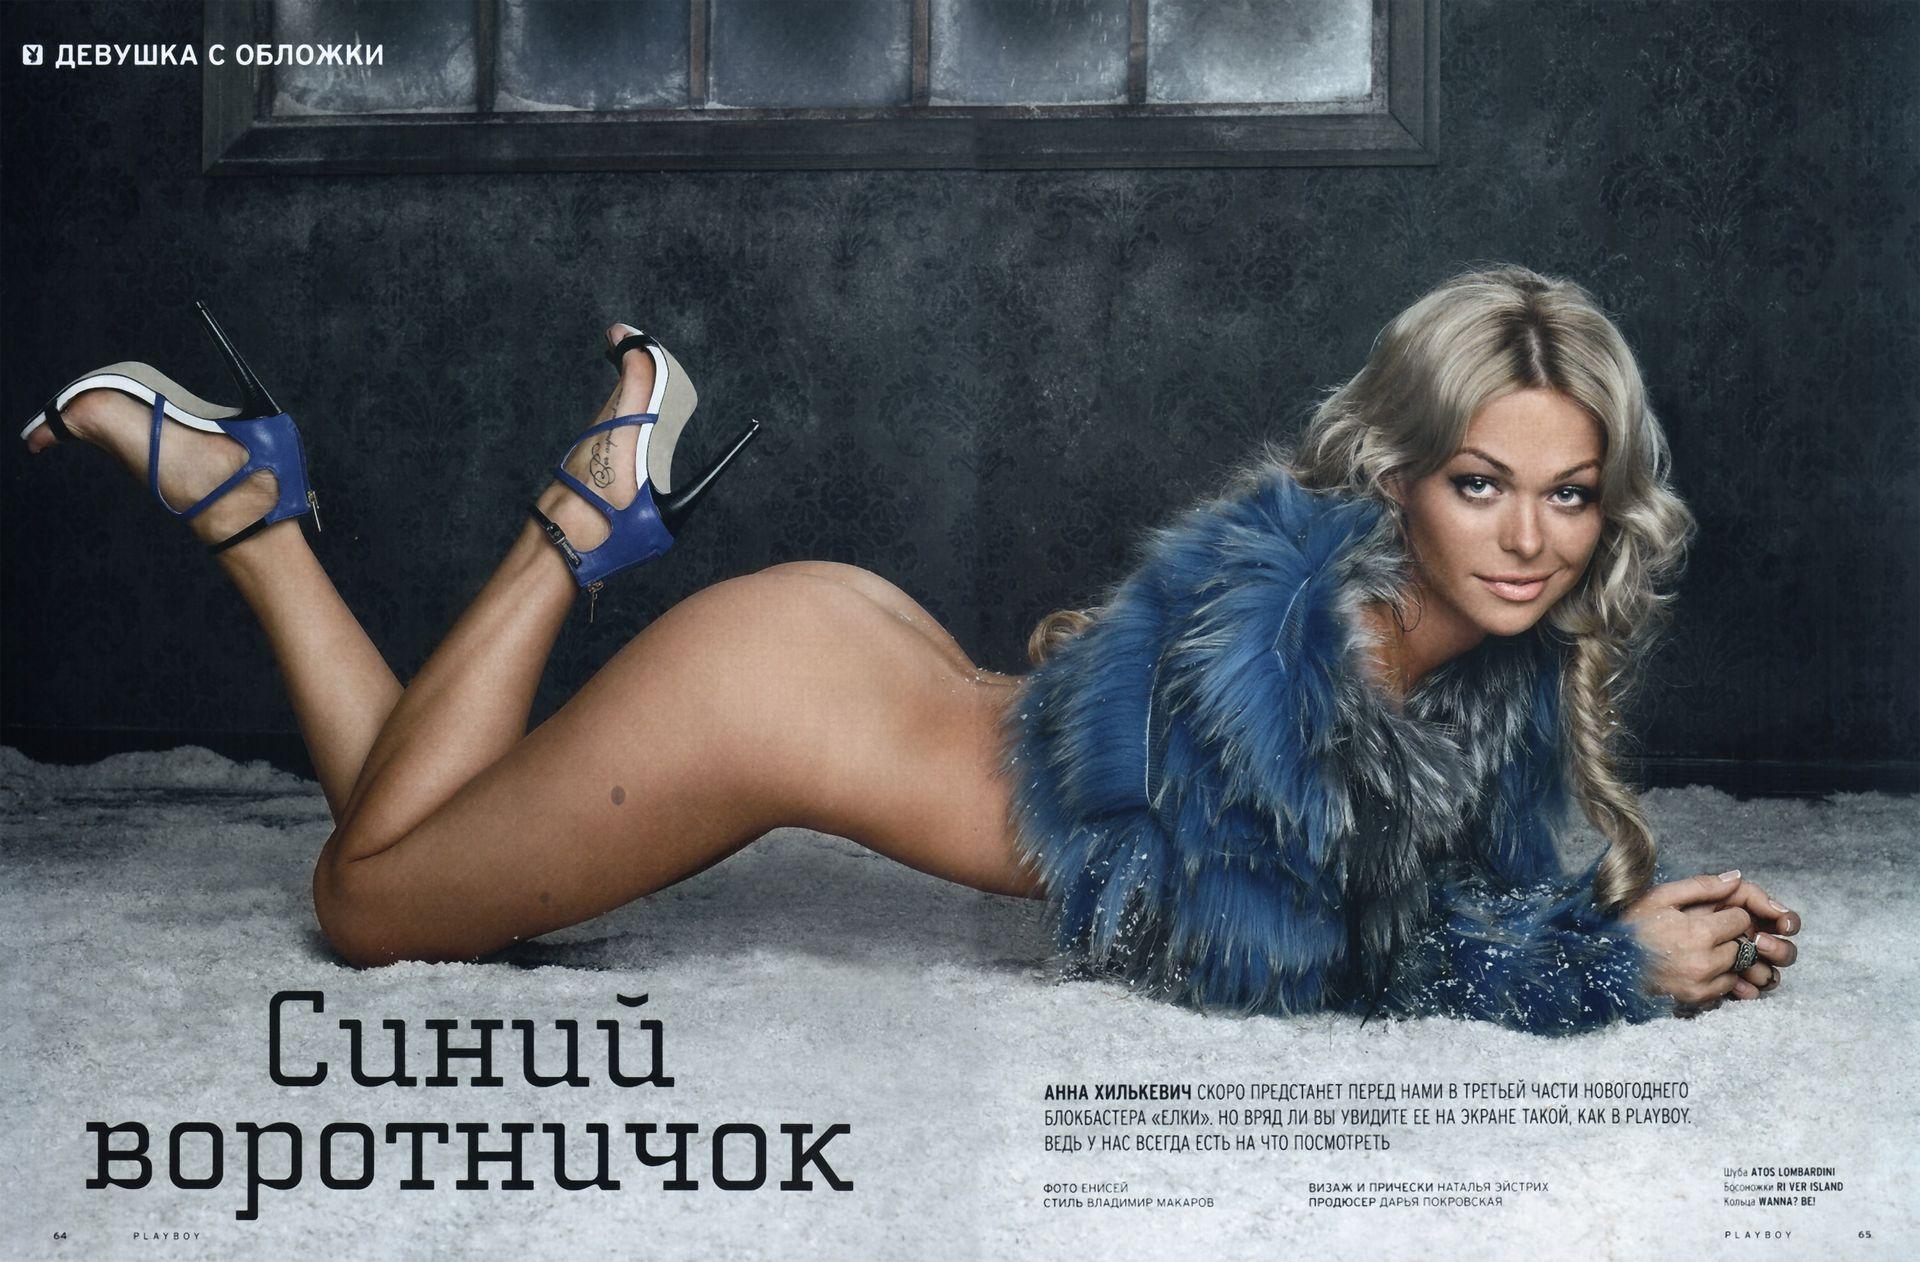 Анна Хилькевич голая. Фото - 35